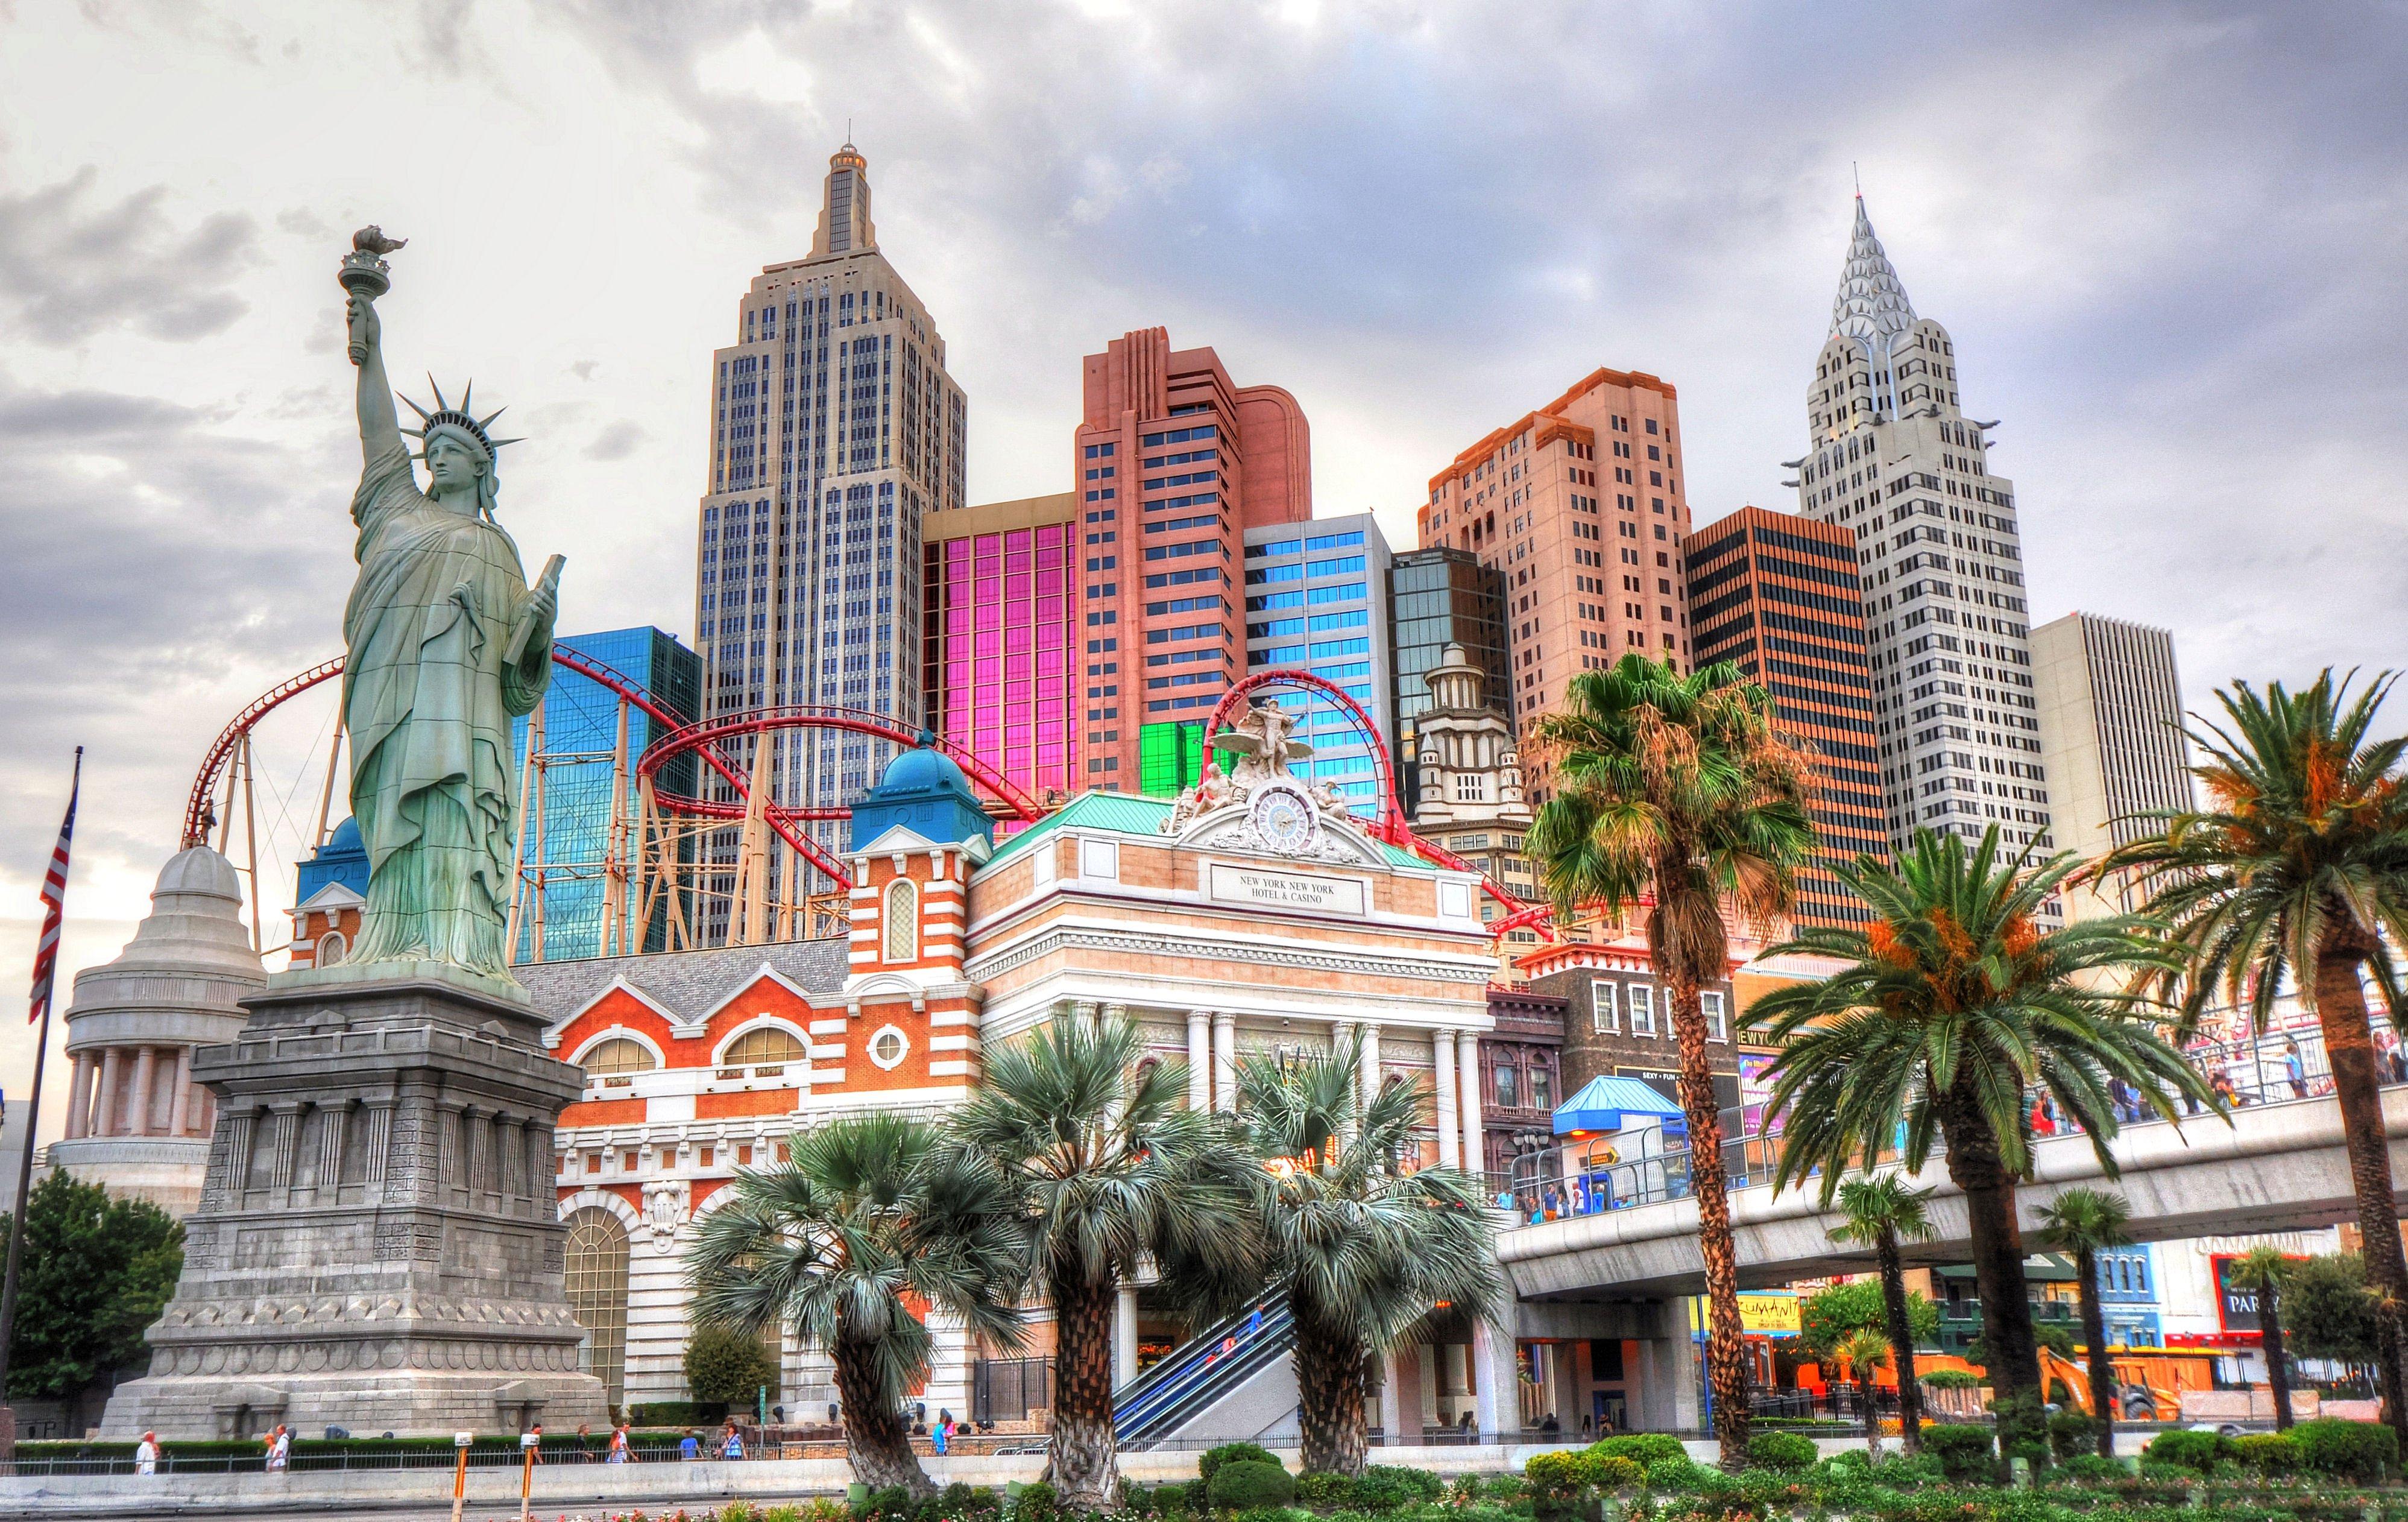 Las Vegas Usa Nevada Wallpaper 3994x2524 247317